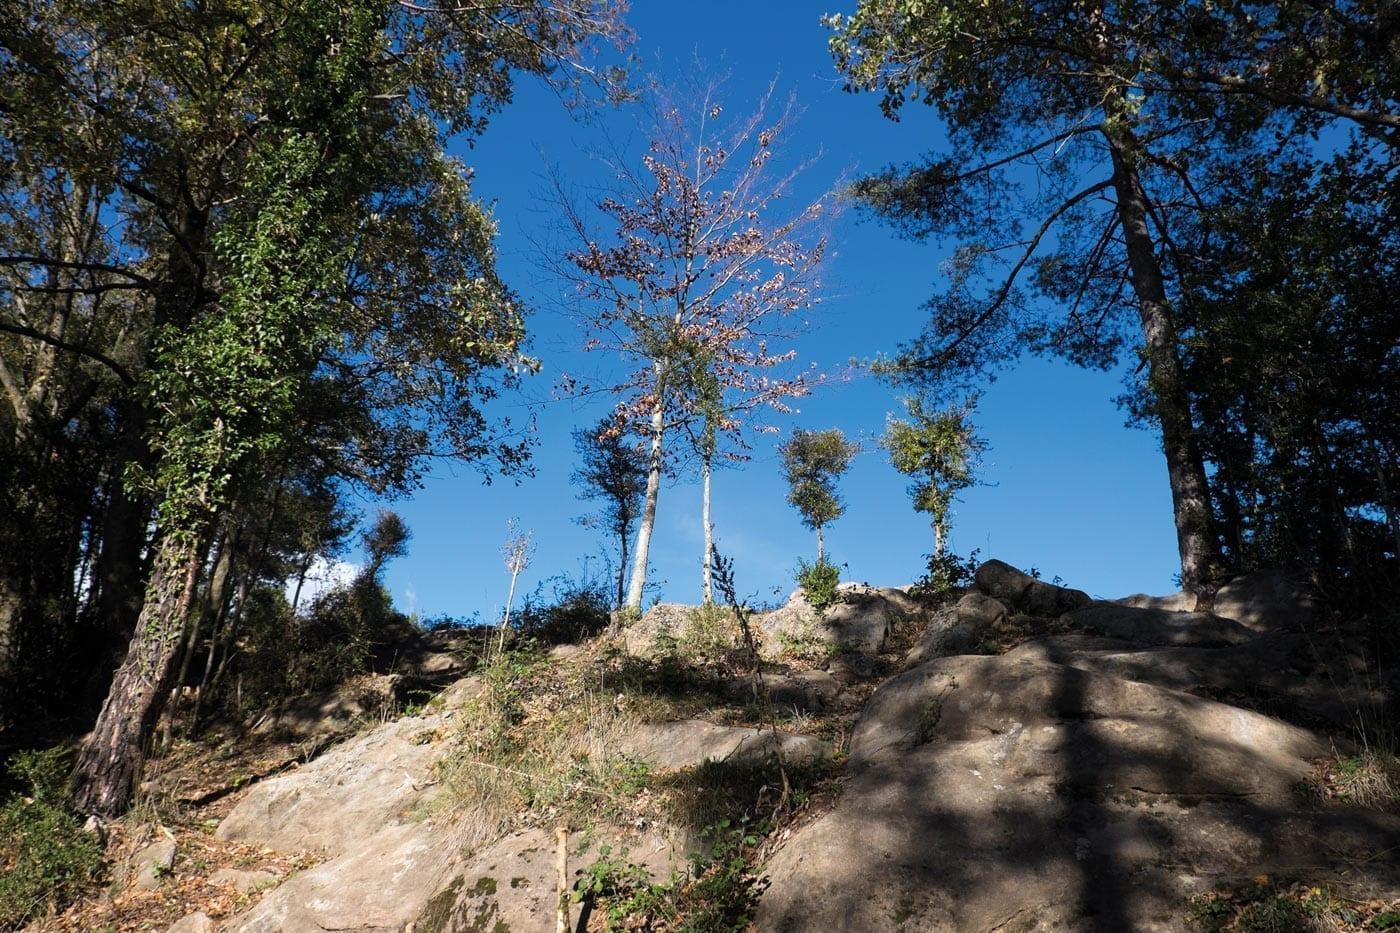 Wanderlust, Wald, Herbst, November, Naturliebe, Natur. Der Herbst ist da!